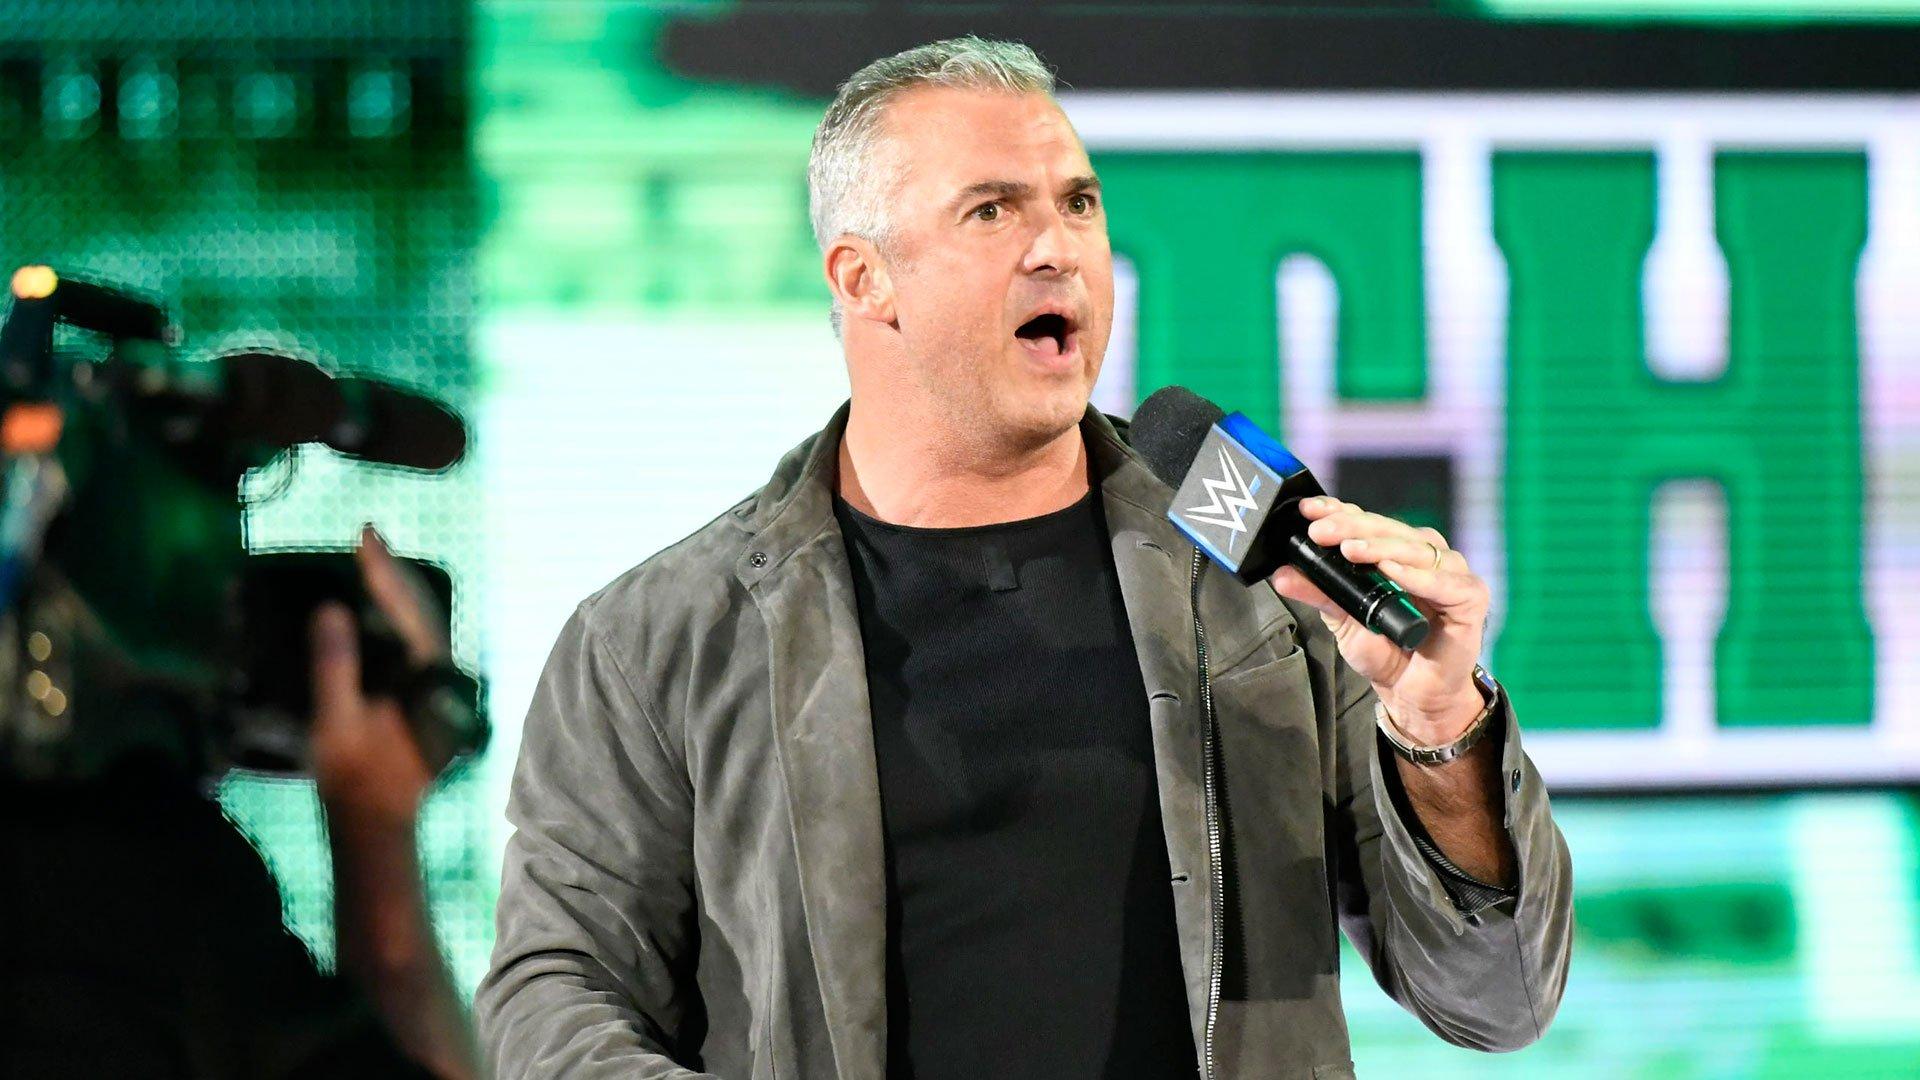 SmackDown LIVE Commissioner Shane McMahon hits the scene.